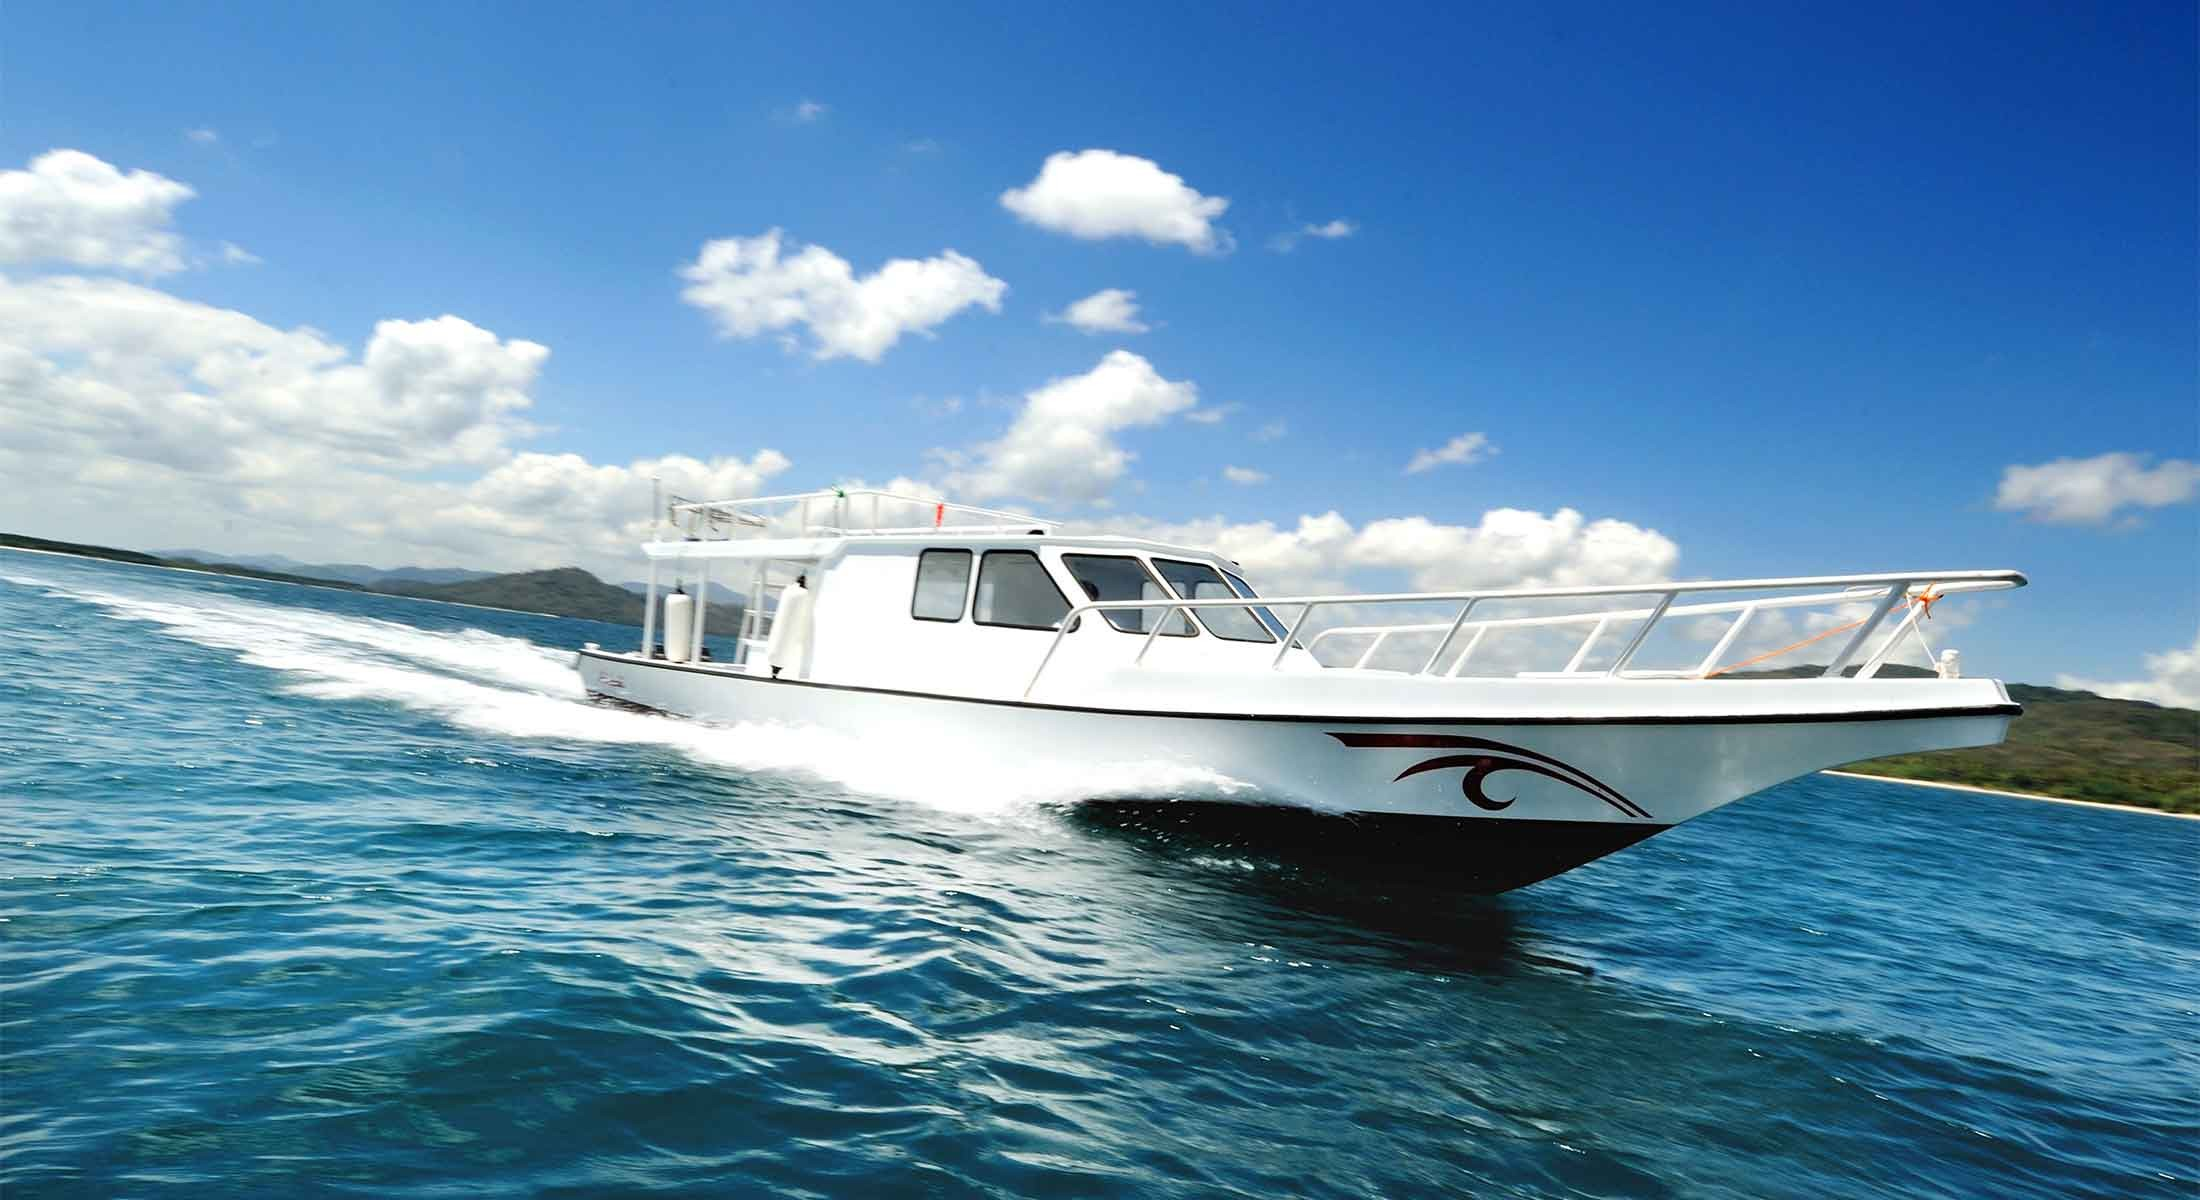 Anjani-Boat-2200x1200